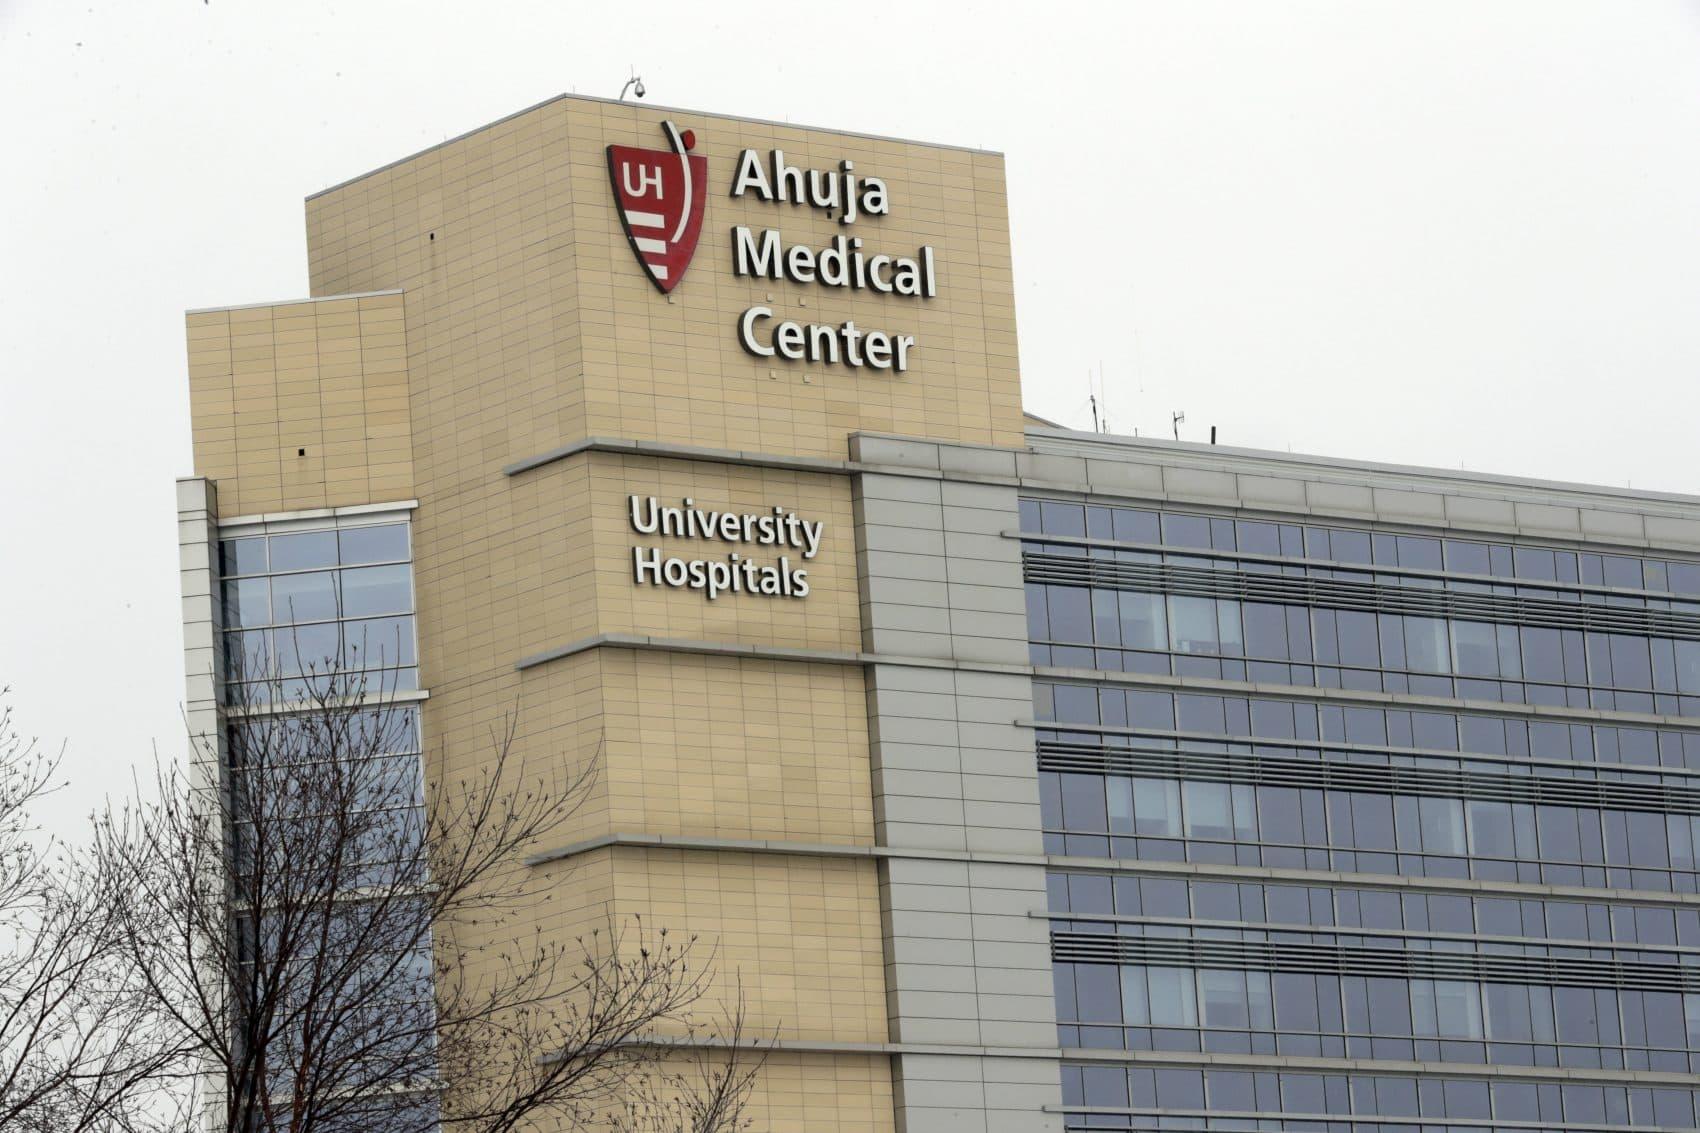 This photo shows the University Hospital Ahuja Medical Center, Monday, March 12, 2018, in Beachwood, Ohio. (AP Photo/Tony Dejak)